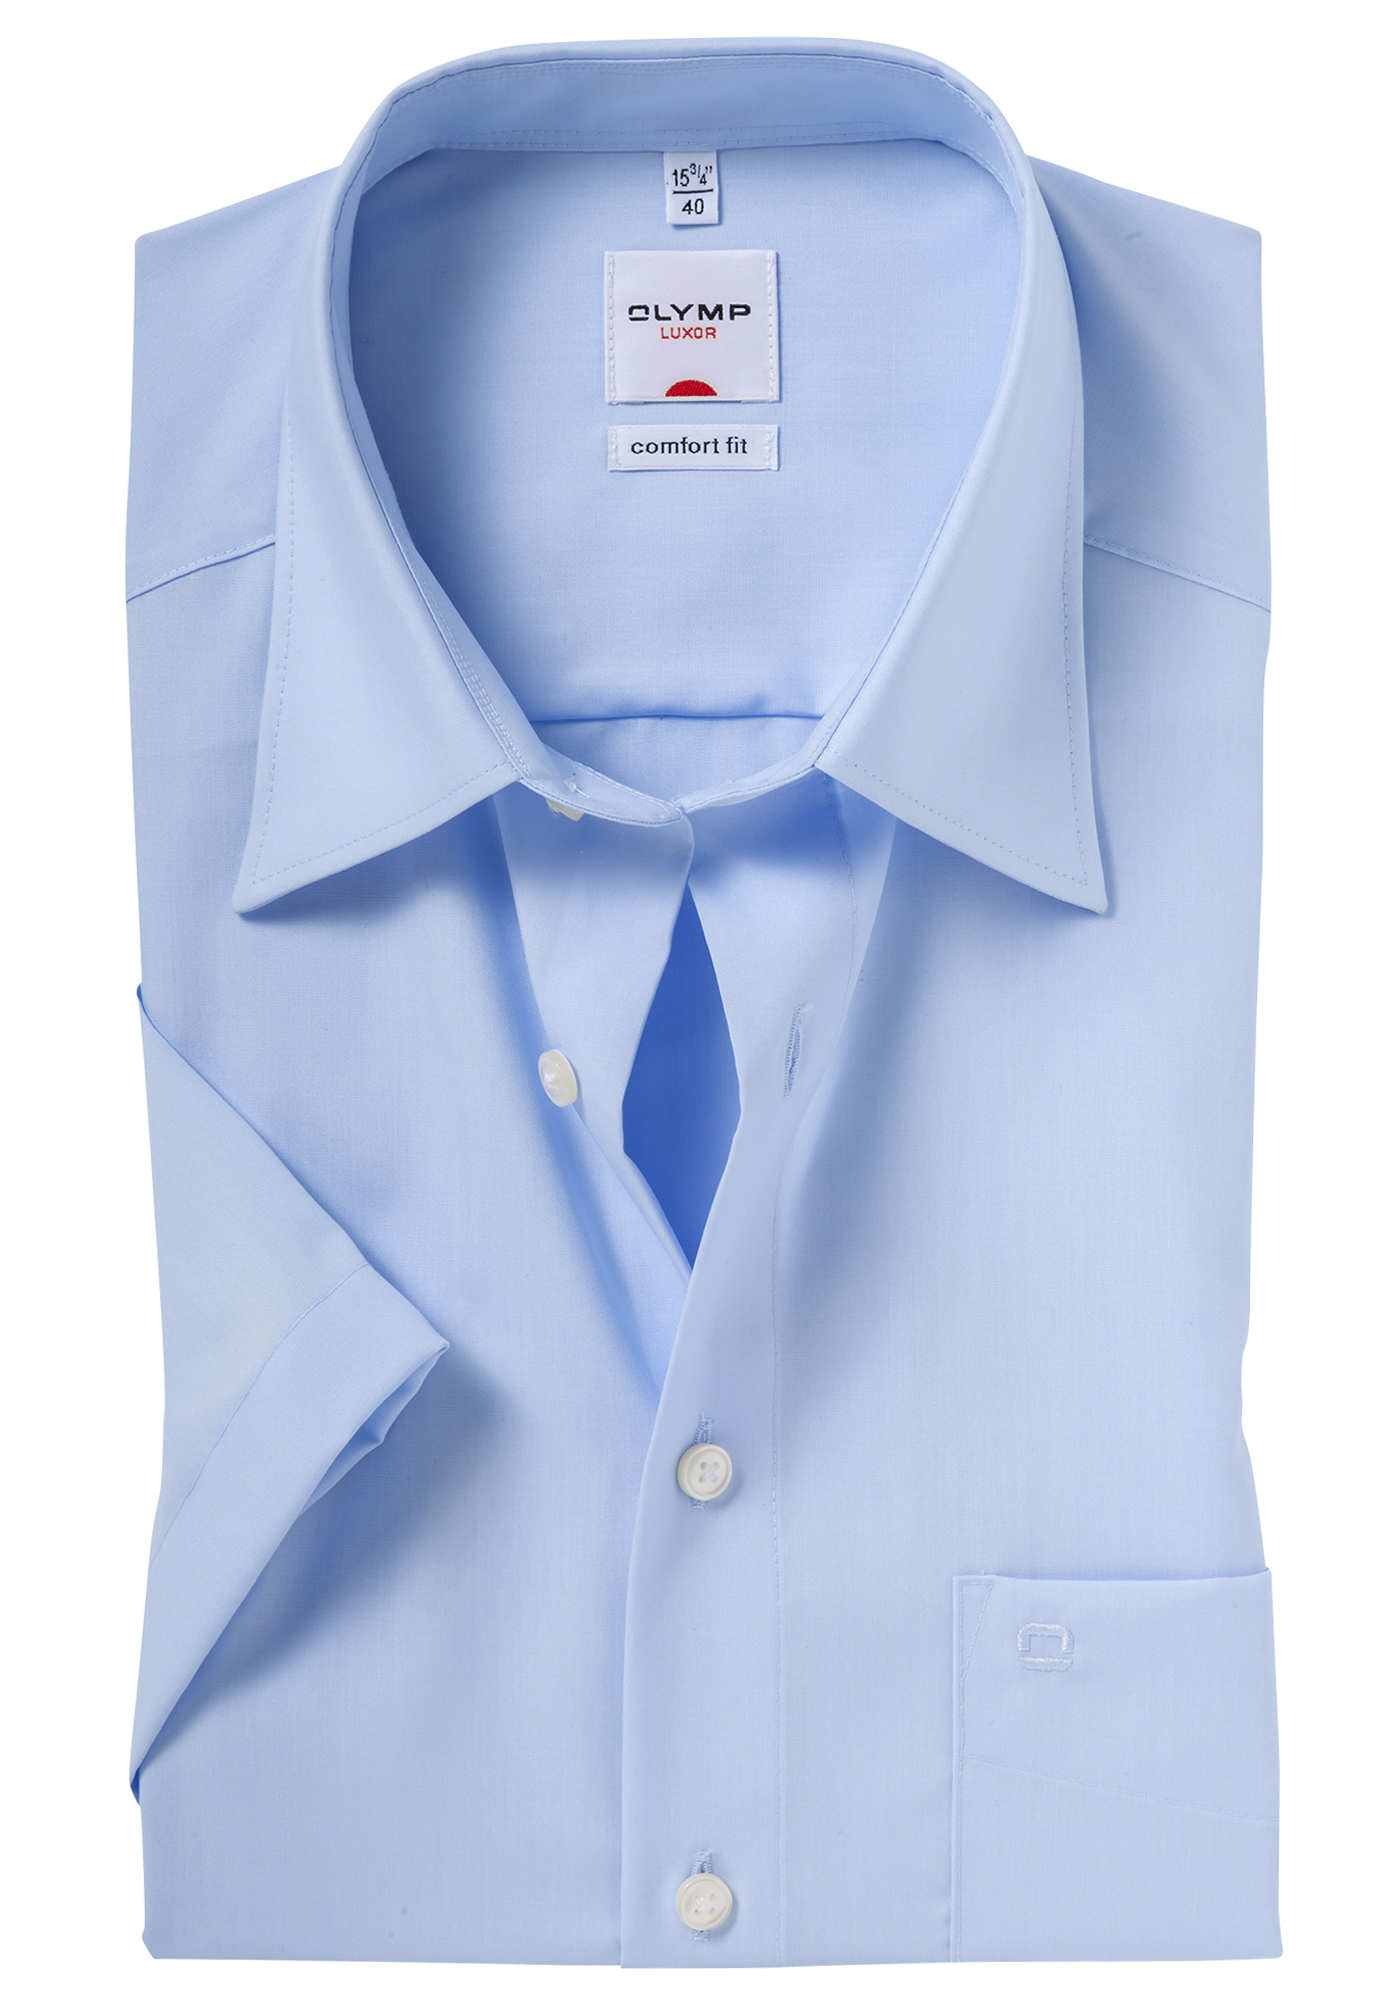 overhemd olymp comfort fit korte mouw blauw gratis bezorgd. Black Bedroom Furniture Sets. Home Design Ideas